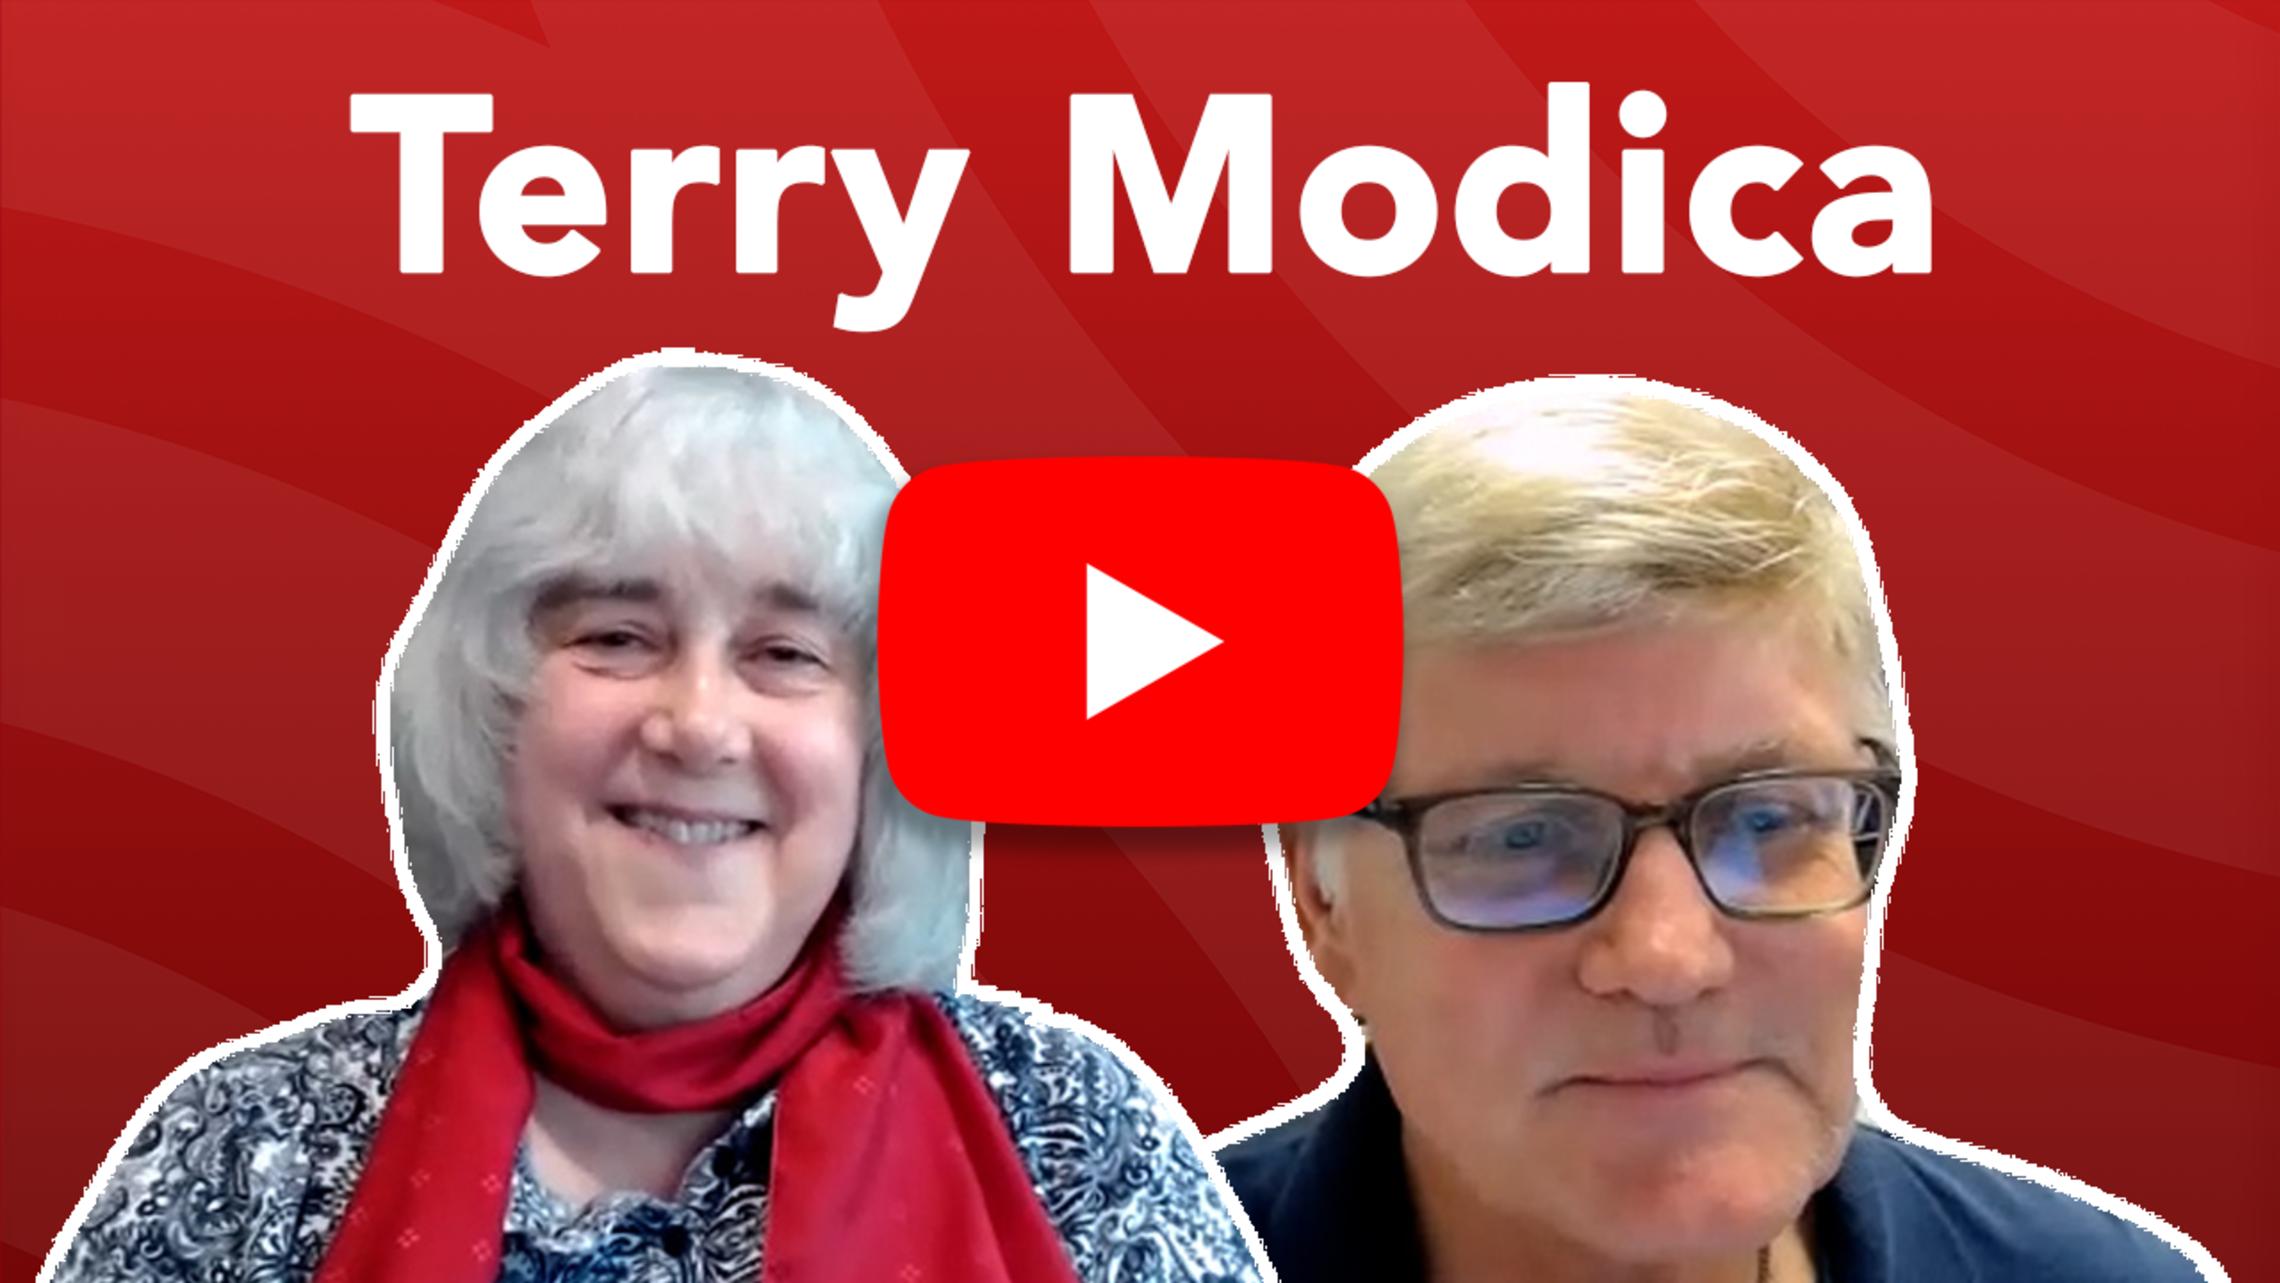 Terry Modica Tn Website